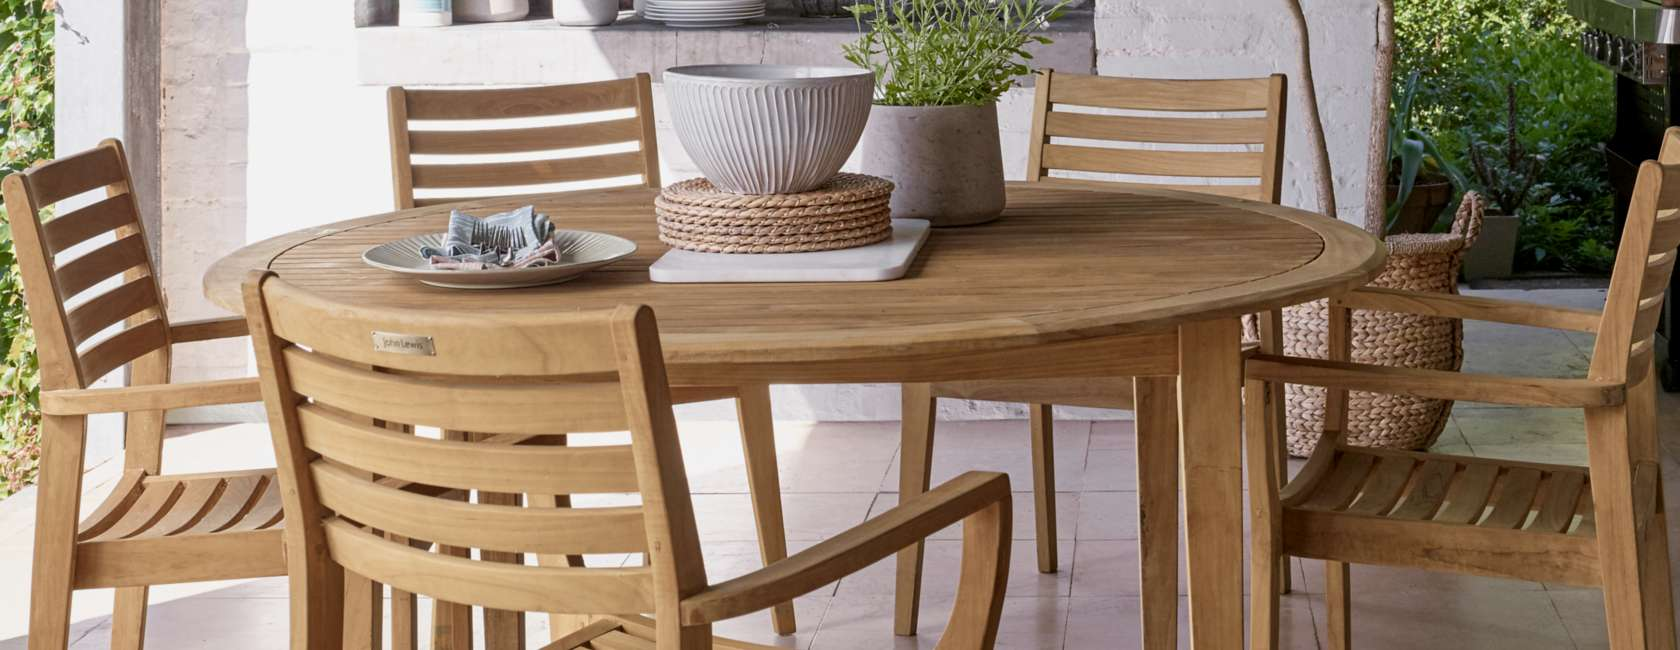 John Lewis & Partners Longstock Outdoor Furniture at John Lewis ...